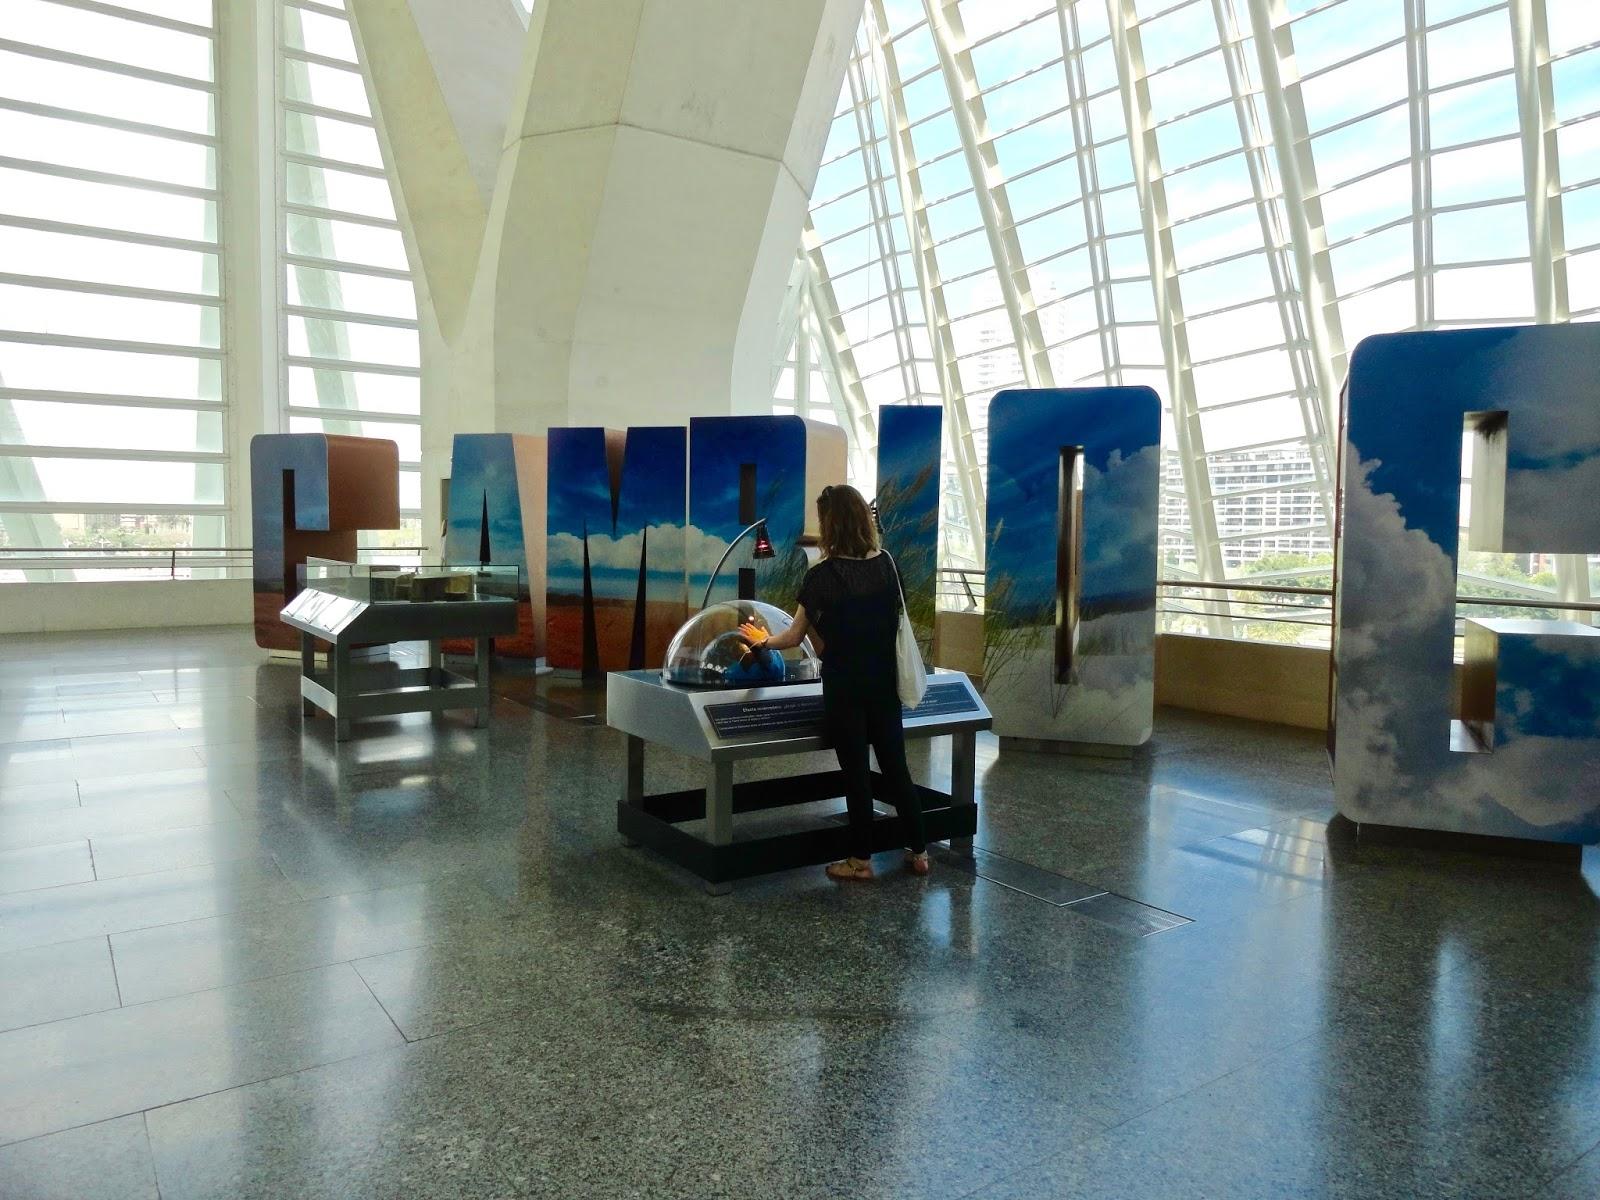 valencia spain museum cambio girl